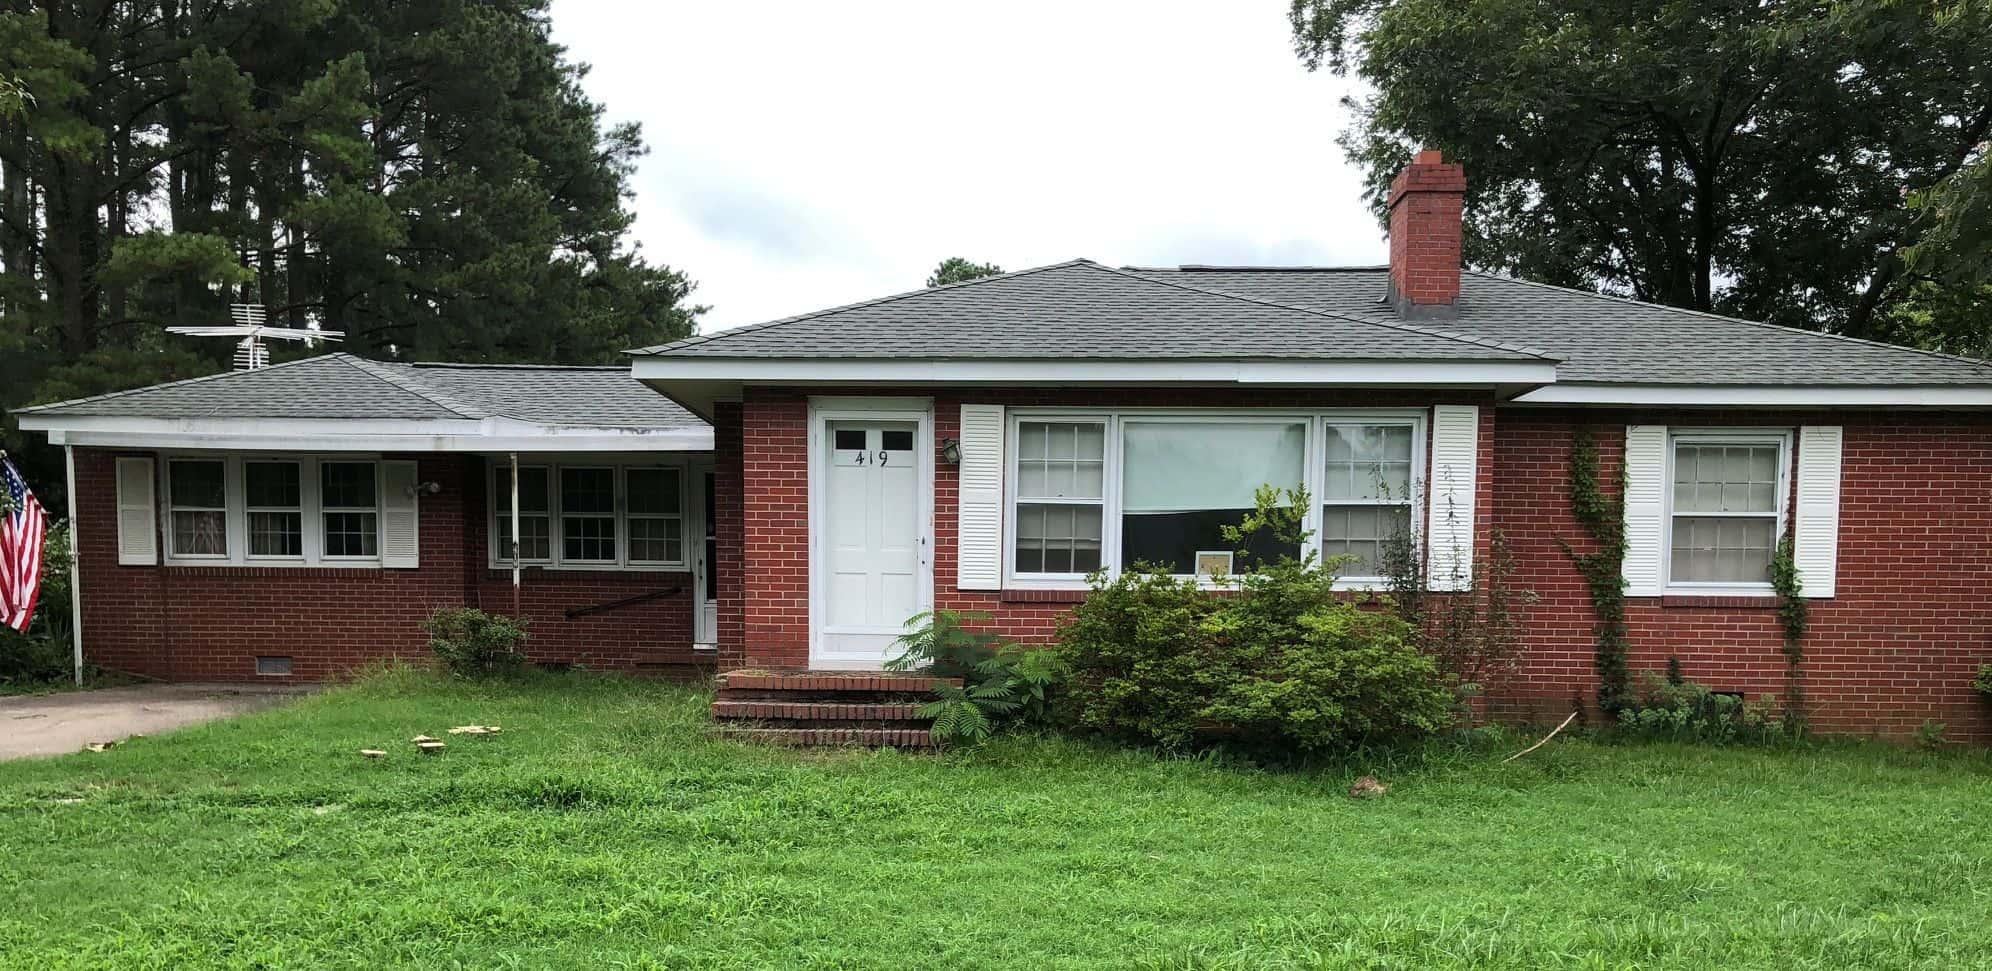 419 W. Main St., Spring Hope, NC